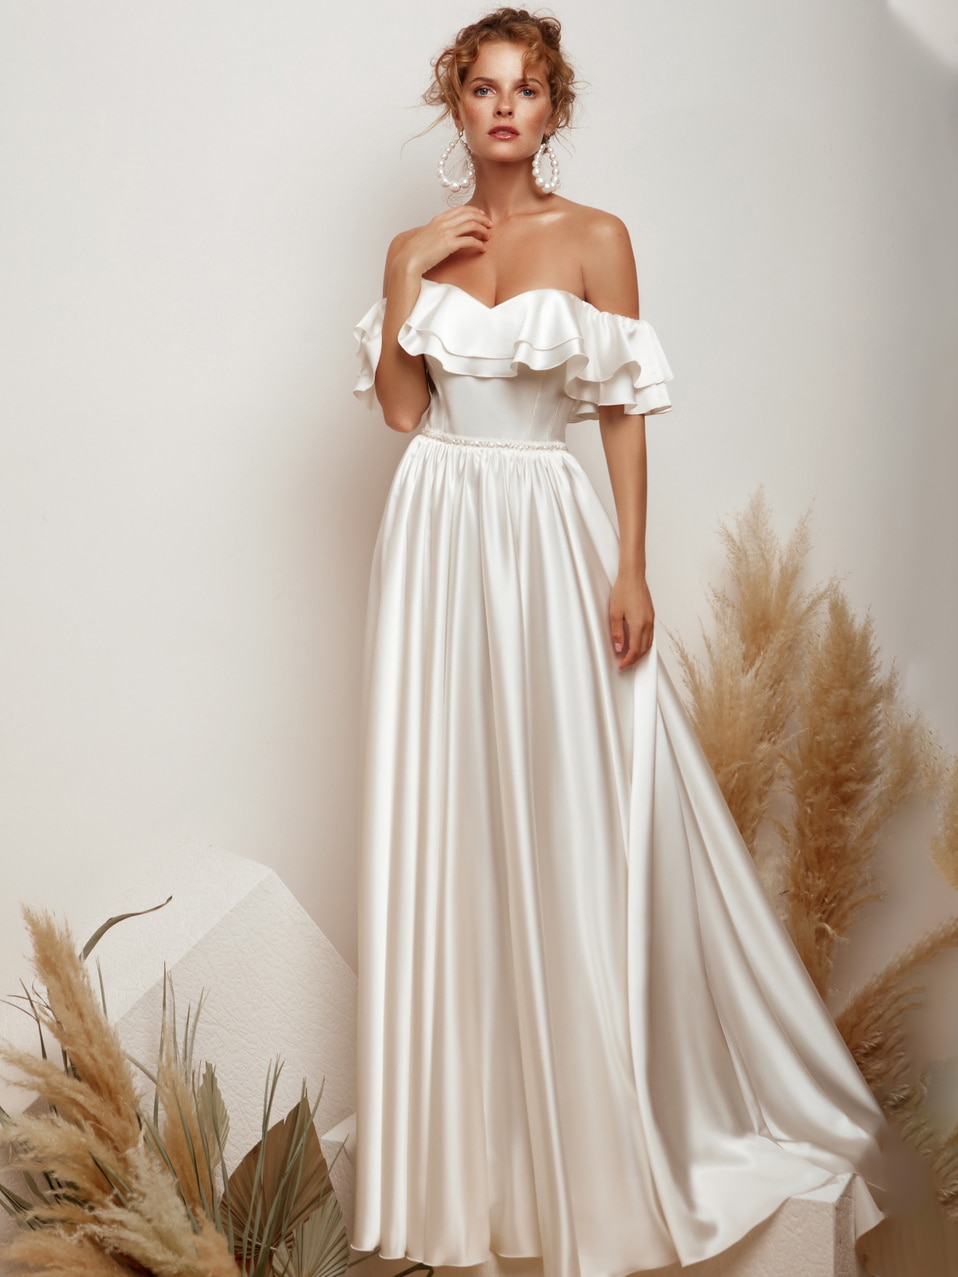 ruffled-satin-off-the-shoulder-wedding-dress-vintage-a-line-custom-made-lace-up-beads-2021-plus-size-elegant-elegant-bridal-gown